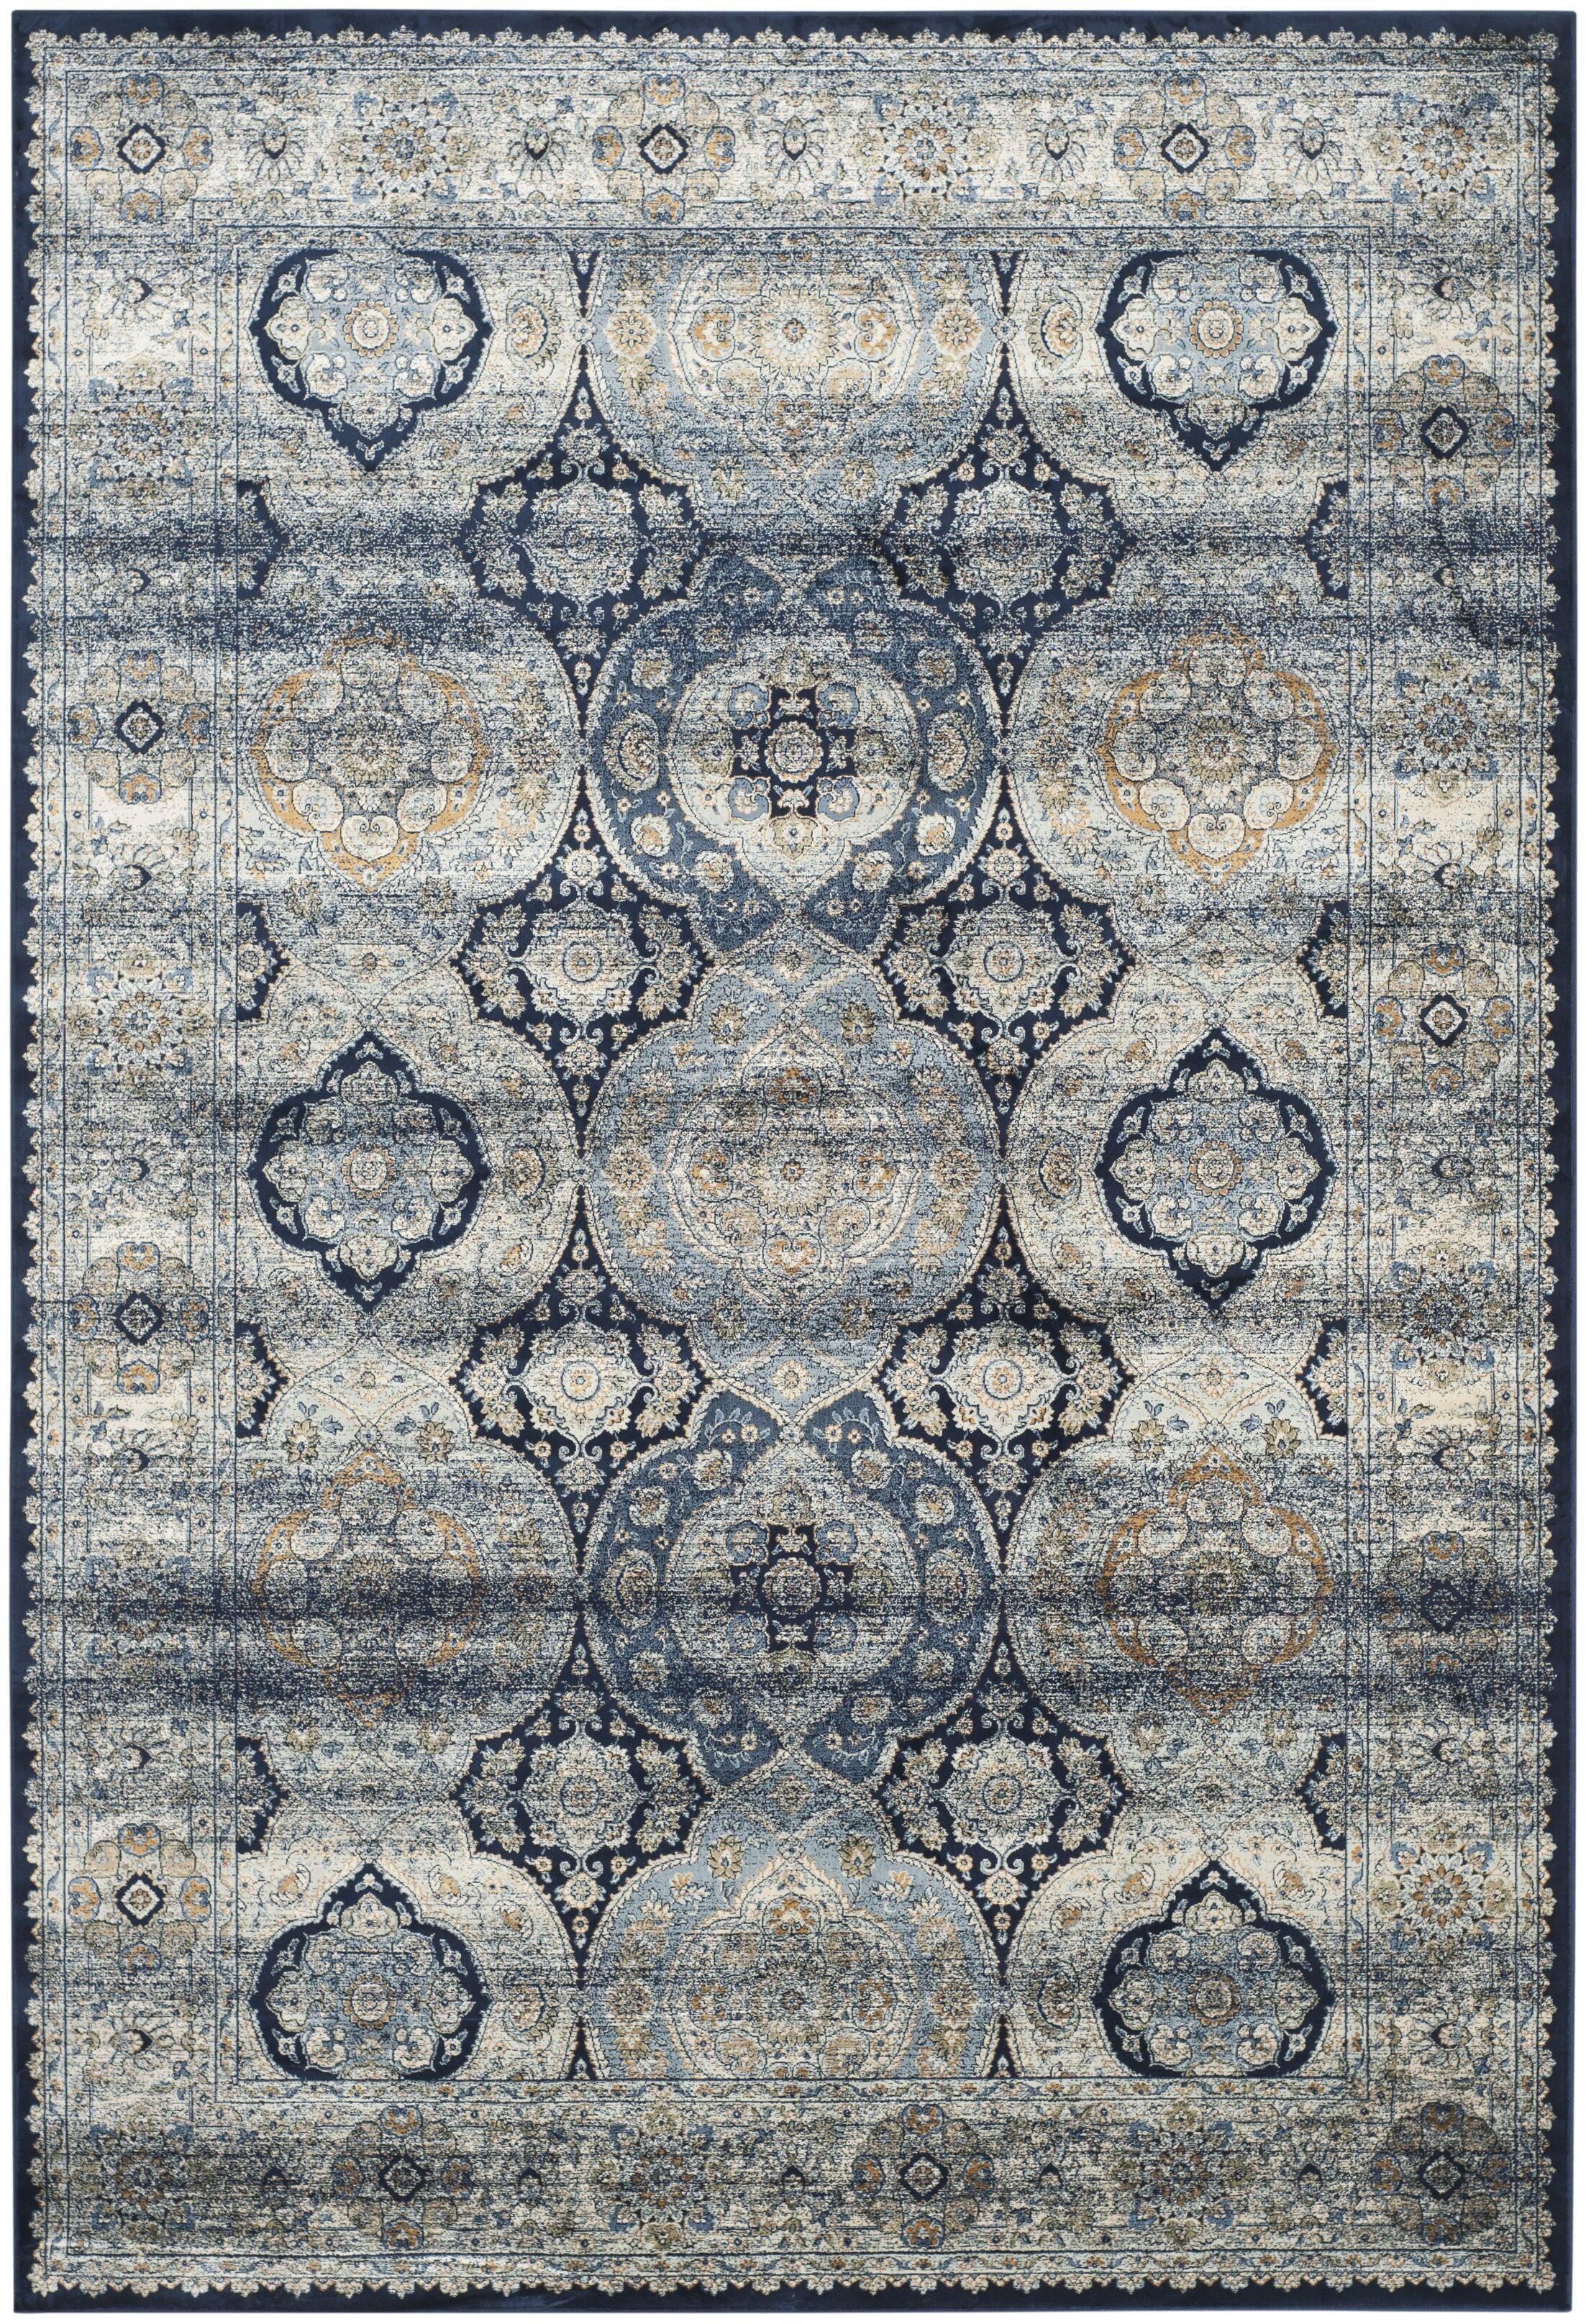 Persian Garden Vintage Navy/Ivory Area Rug Rug Size: Rectangle 8' x 11'2